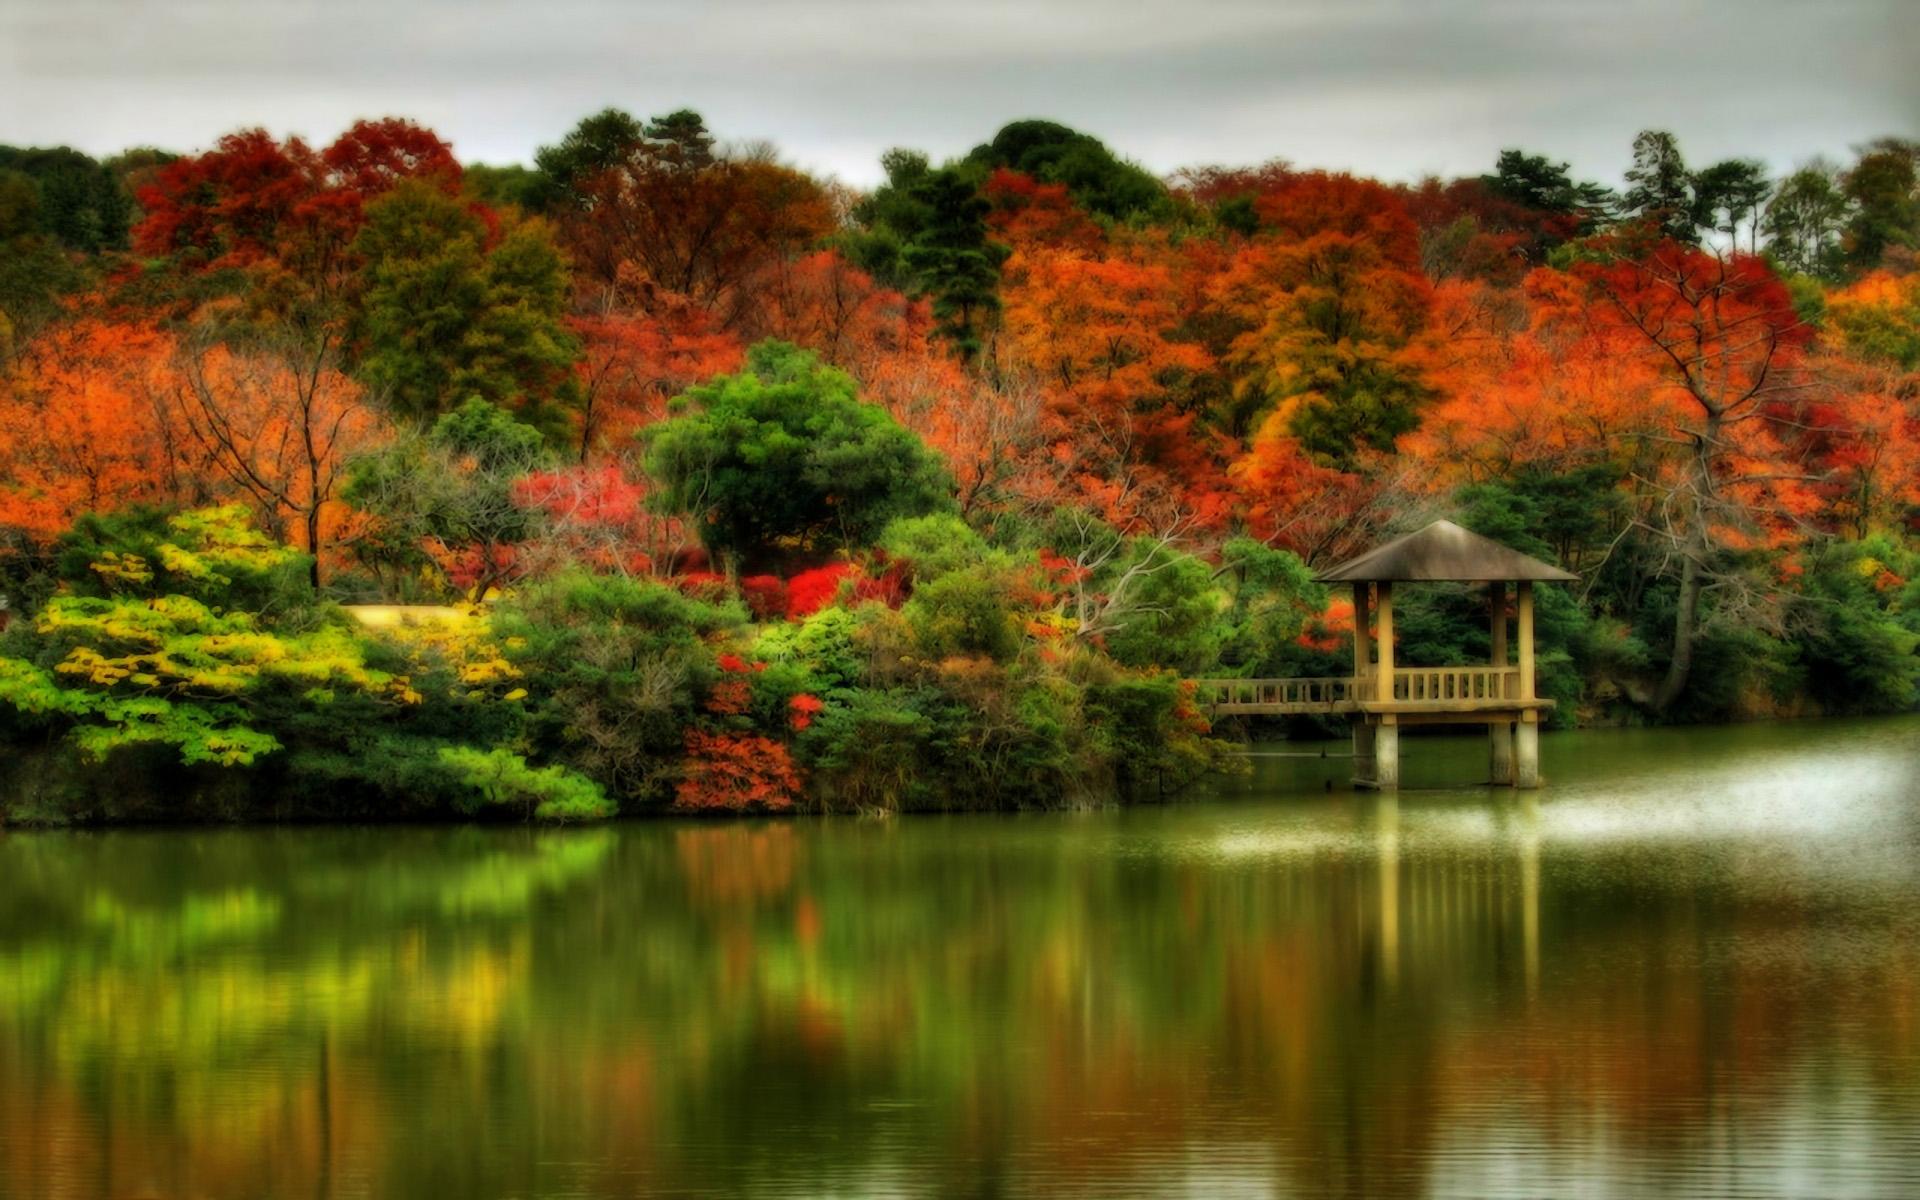 Beautiful Autumn Scenes 1920x1200 Wallpapers 1920x1200 Wallpapers 1920x1200